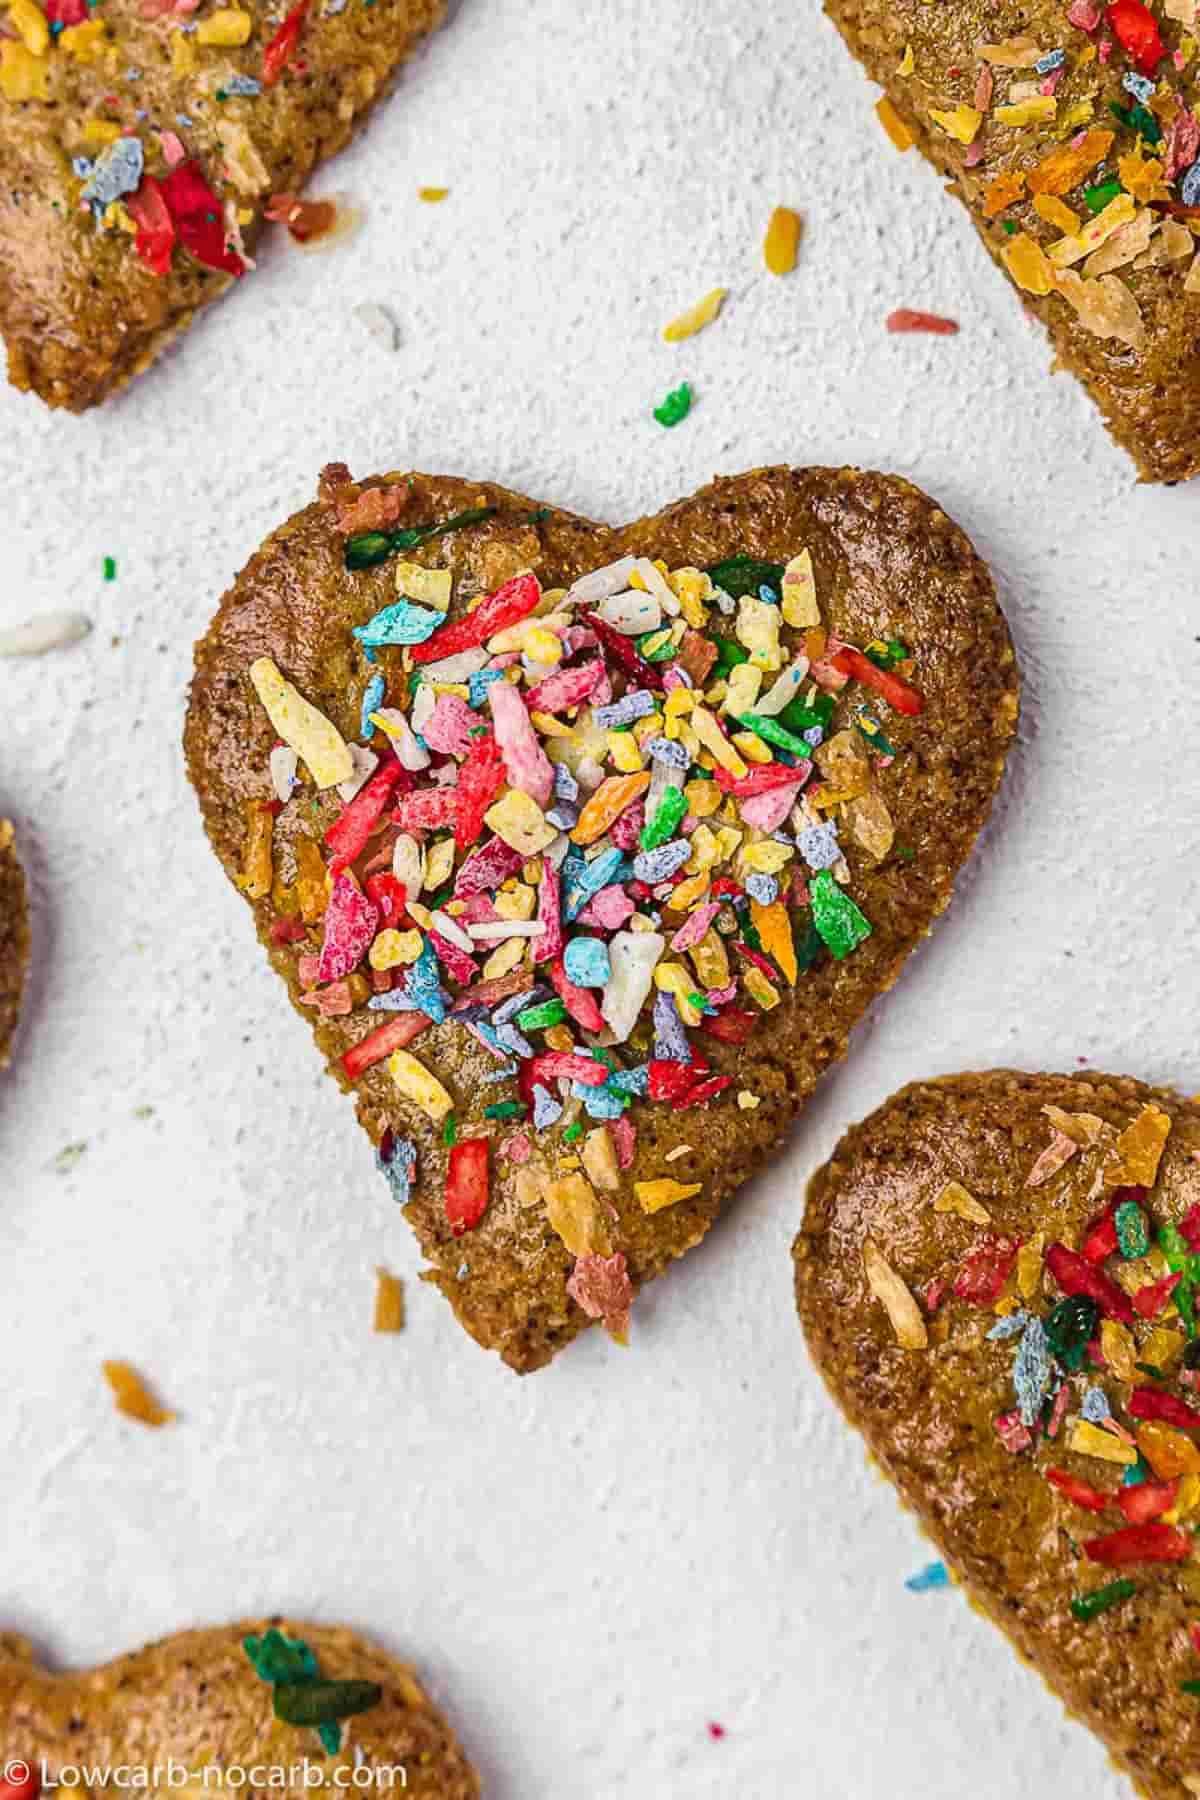 gingerbread cookies gluten-free with Sugar-Free Sprinkles on top